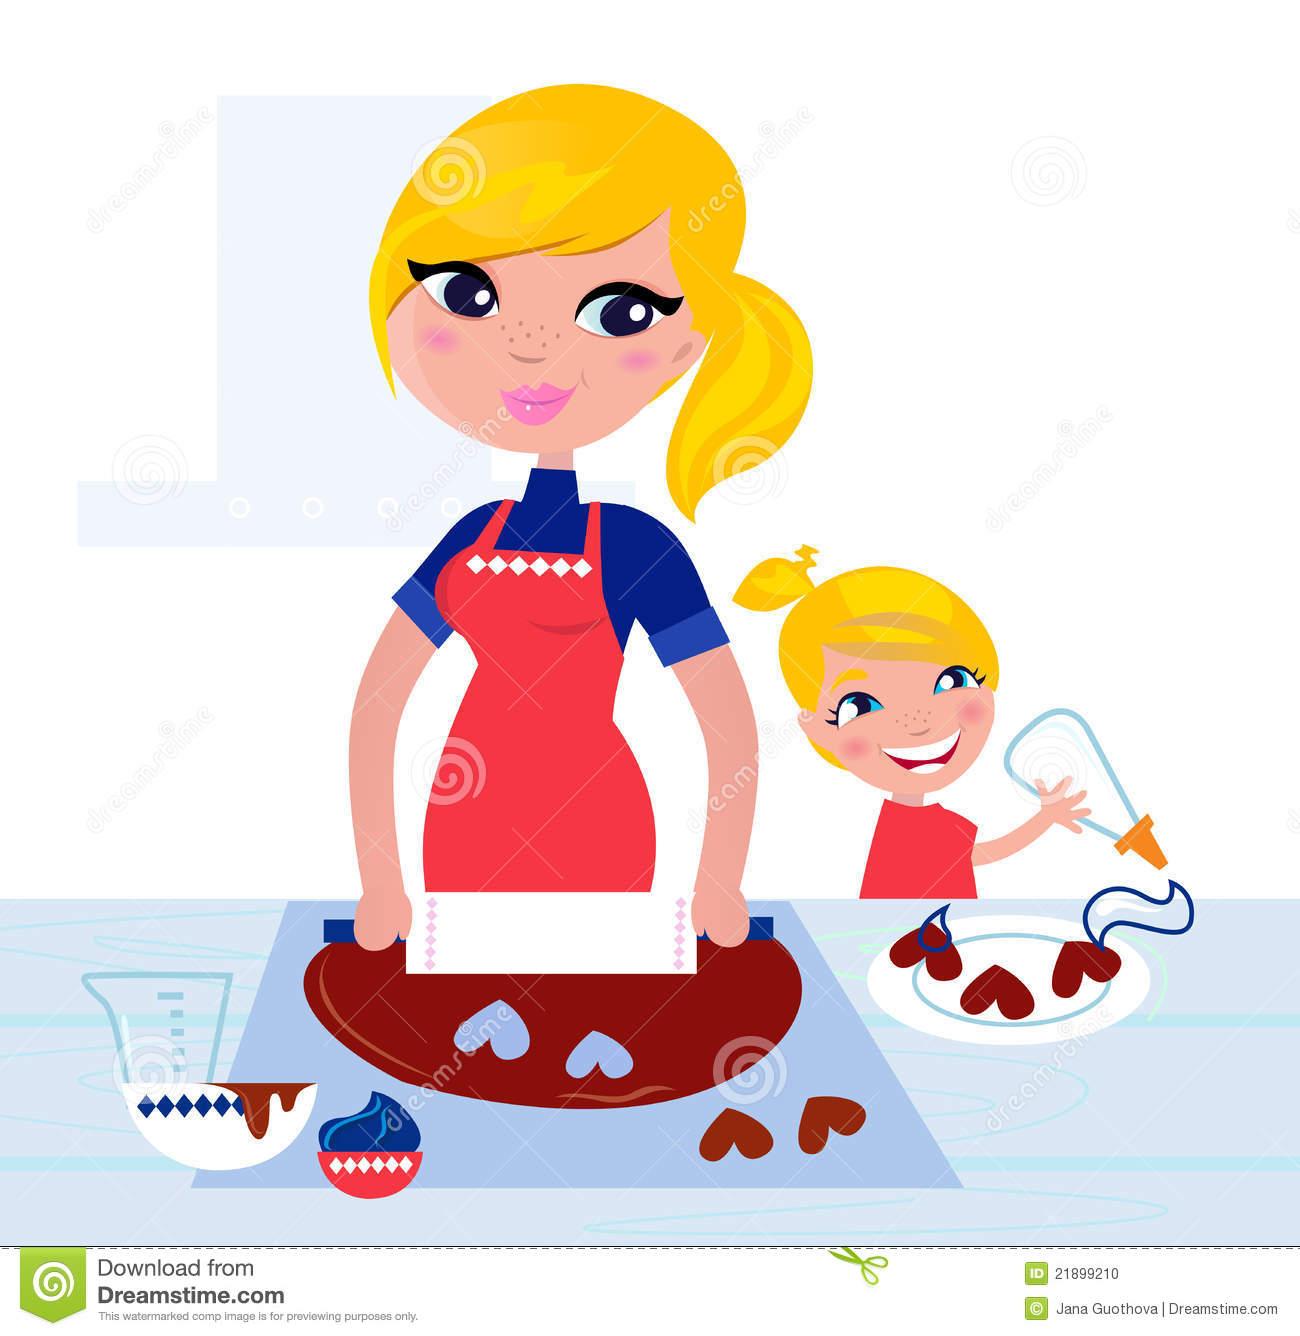 Una madre in vendita s3 valentinacanali gloriadonnini jk1690 4